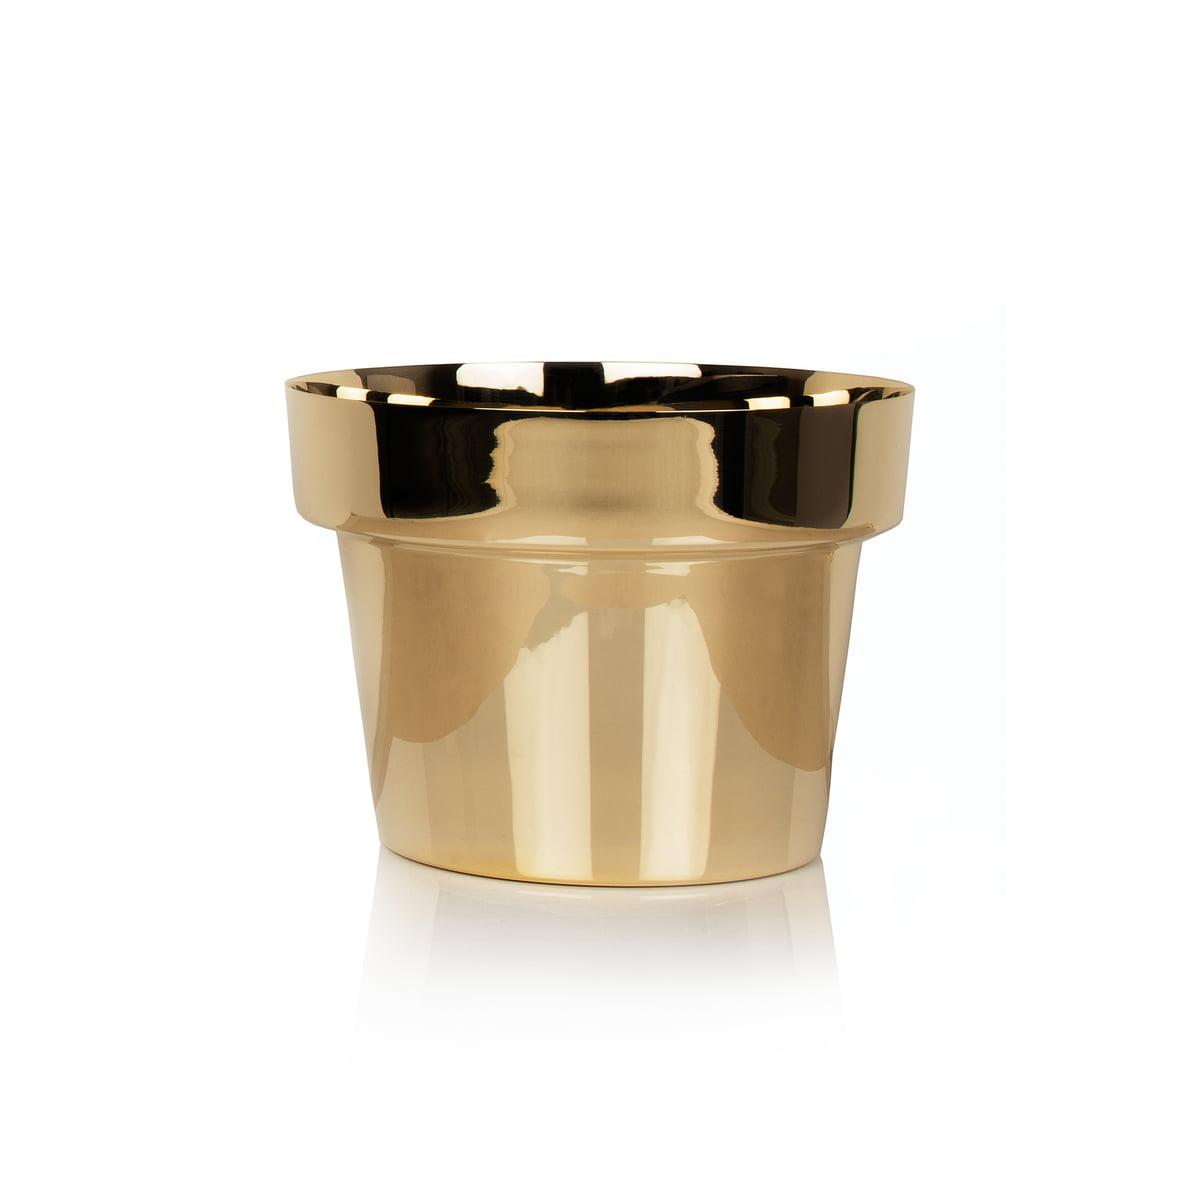 Skultuna - Pot de fleur, petit format, laiton poli